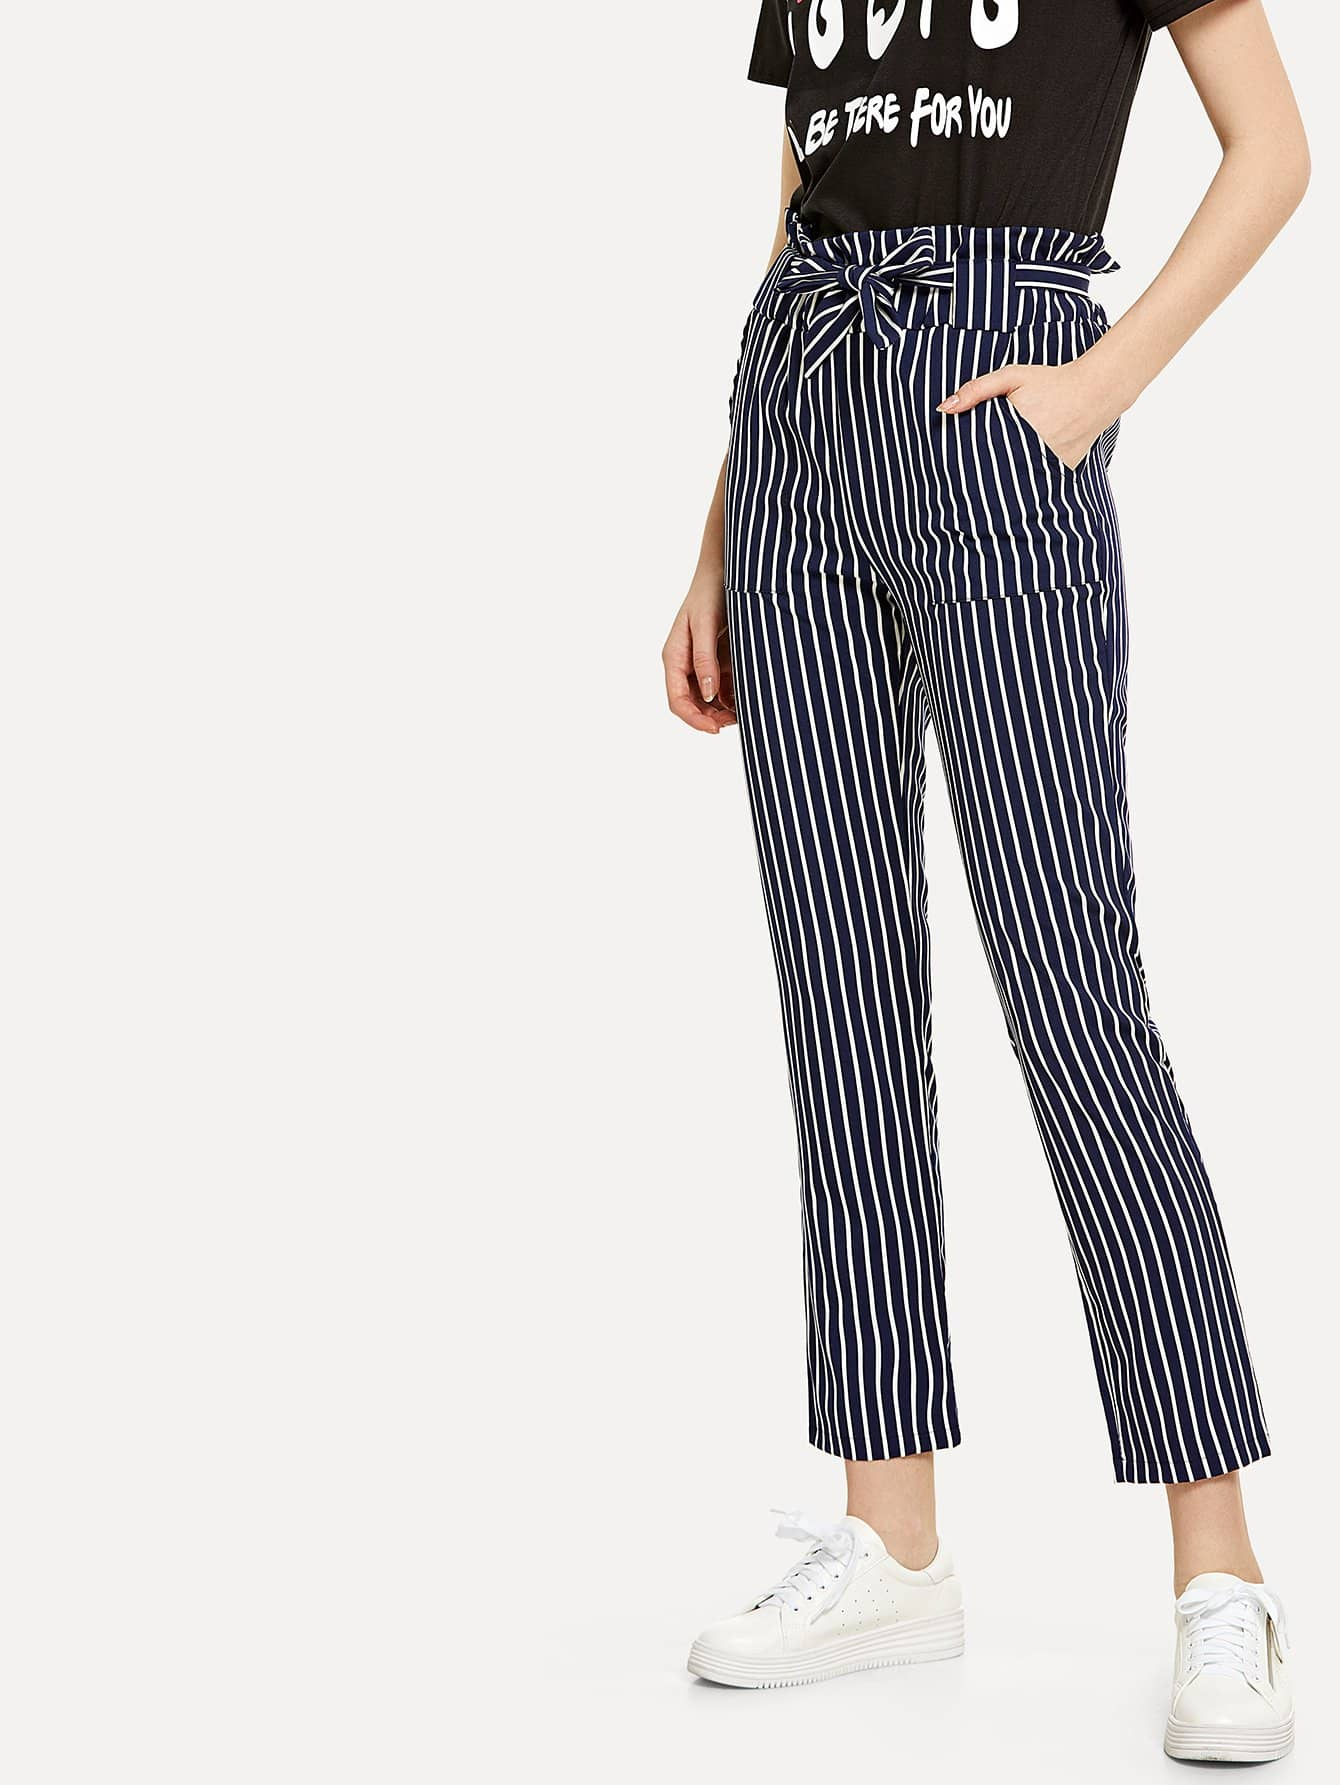 Tie Waist Striped Pants striped ruffled waist self tie pants